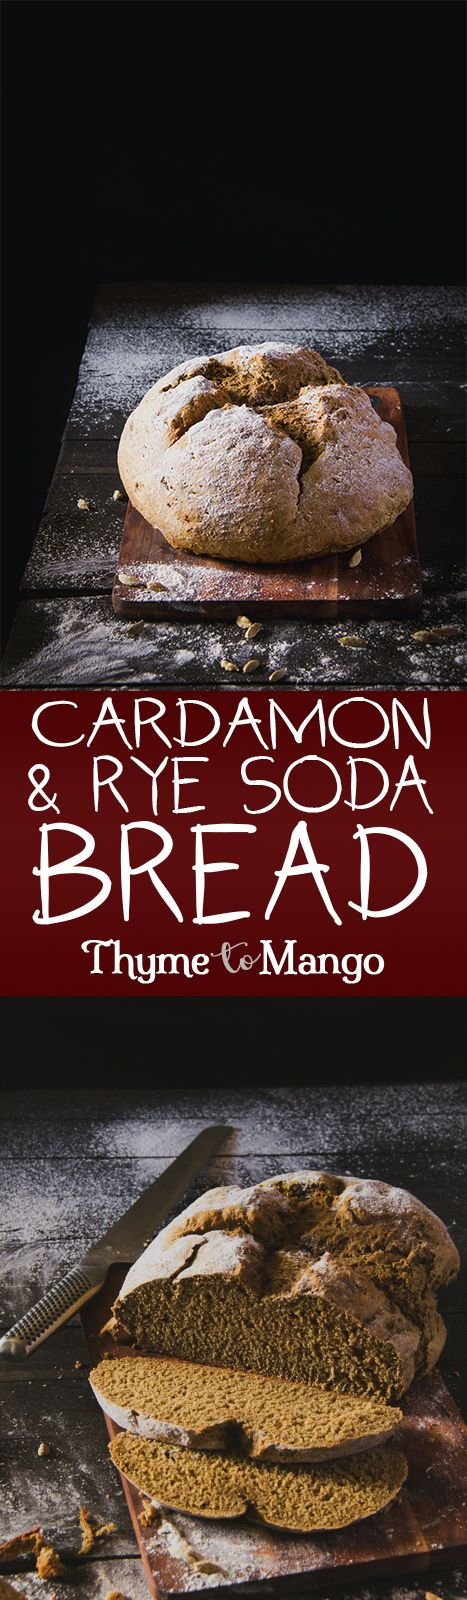 Irish and Swedish cuisines collide into a delicious cardamon infused rye soda bread.